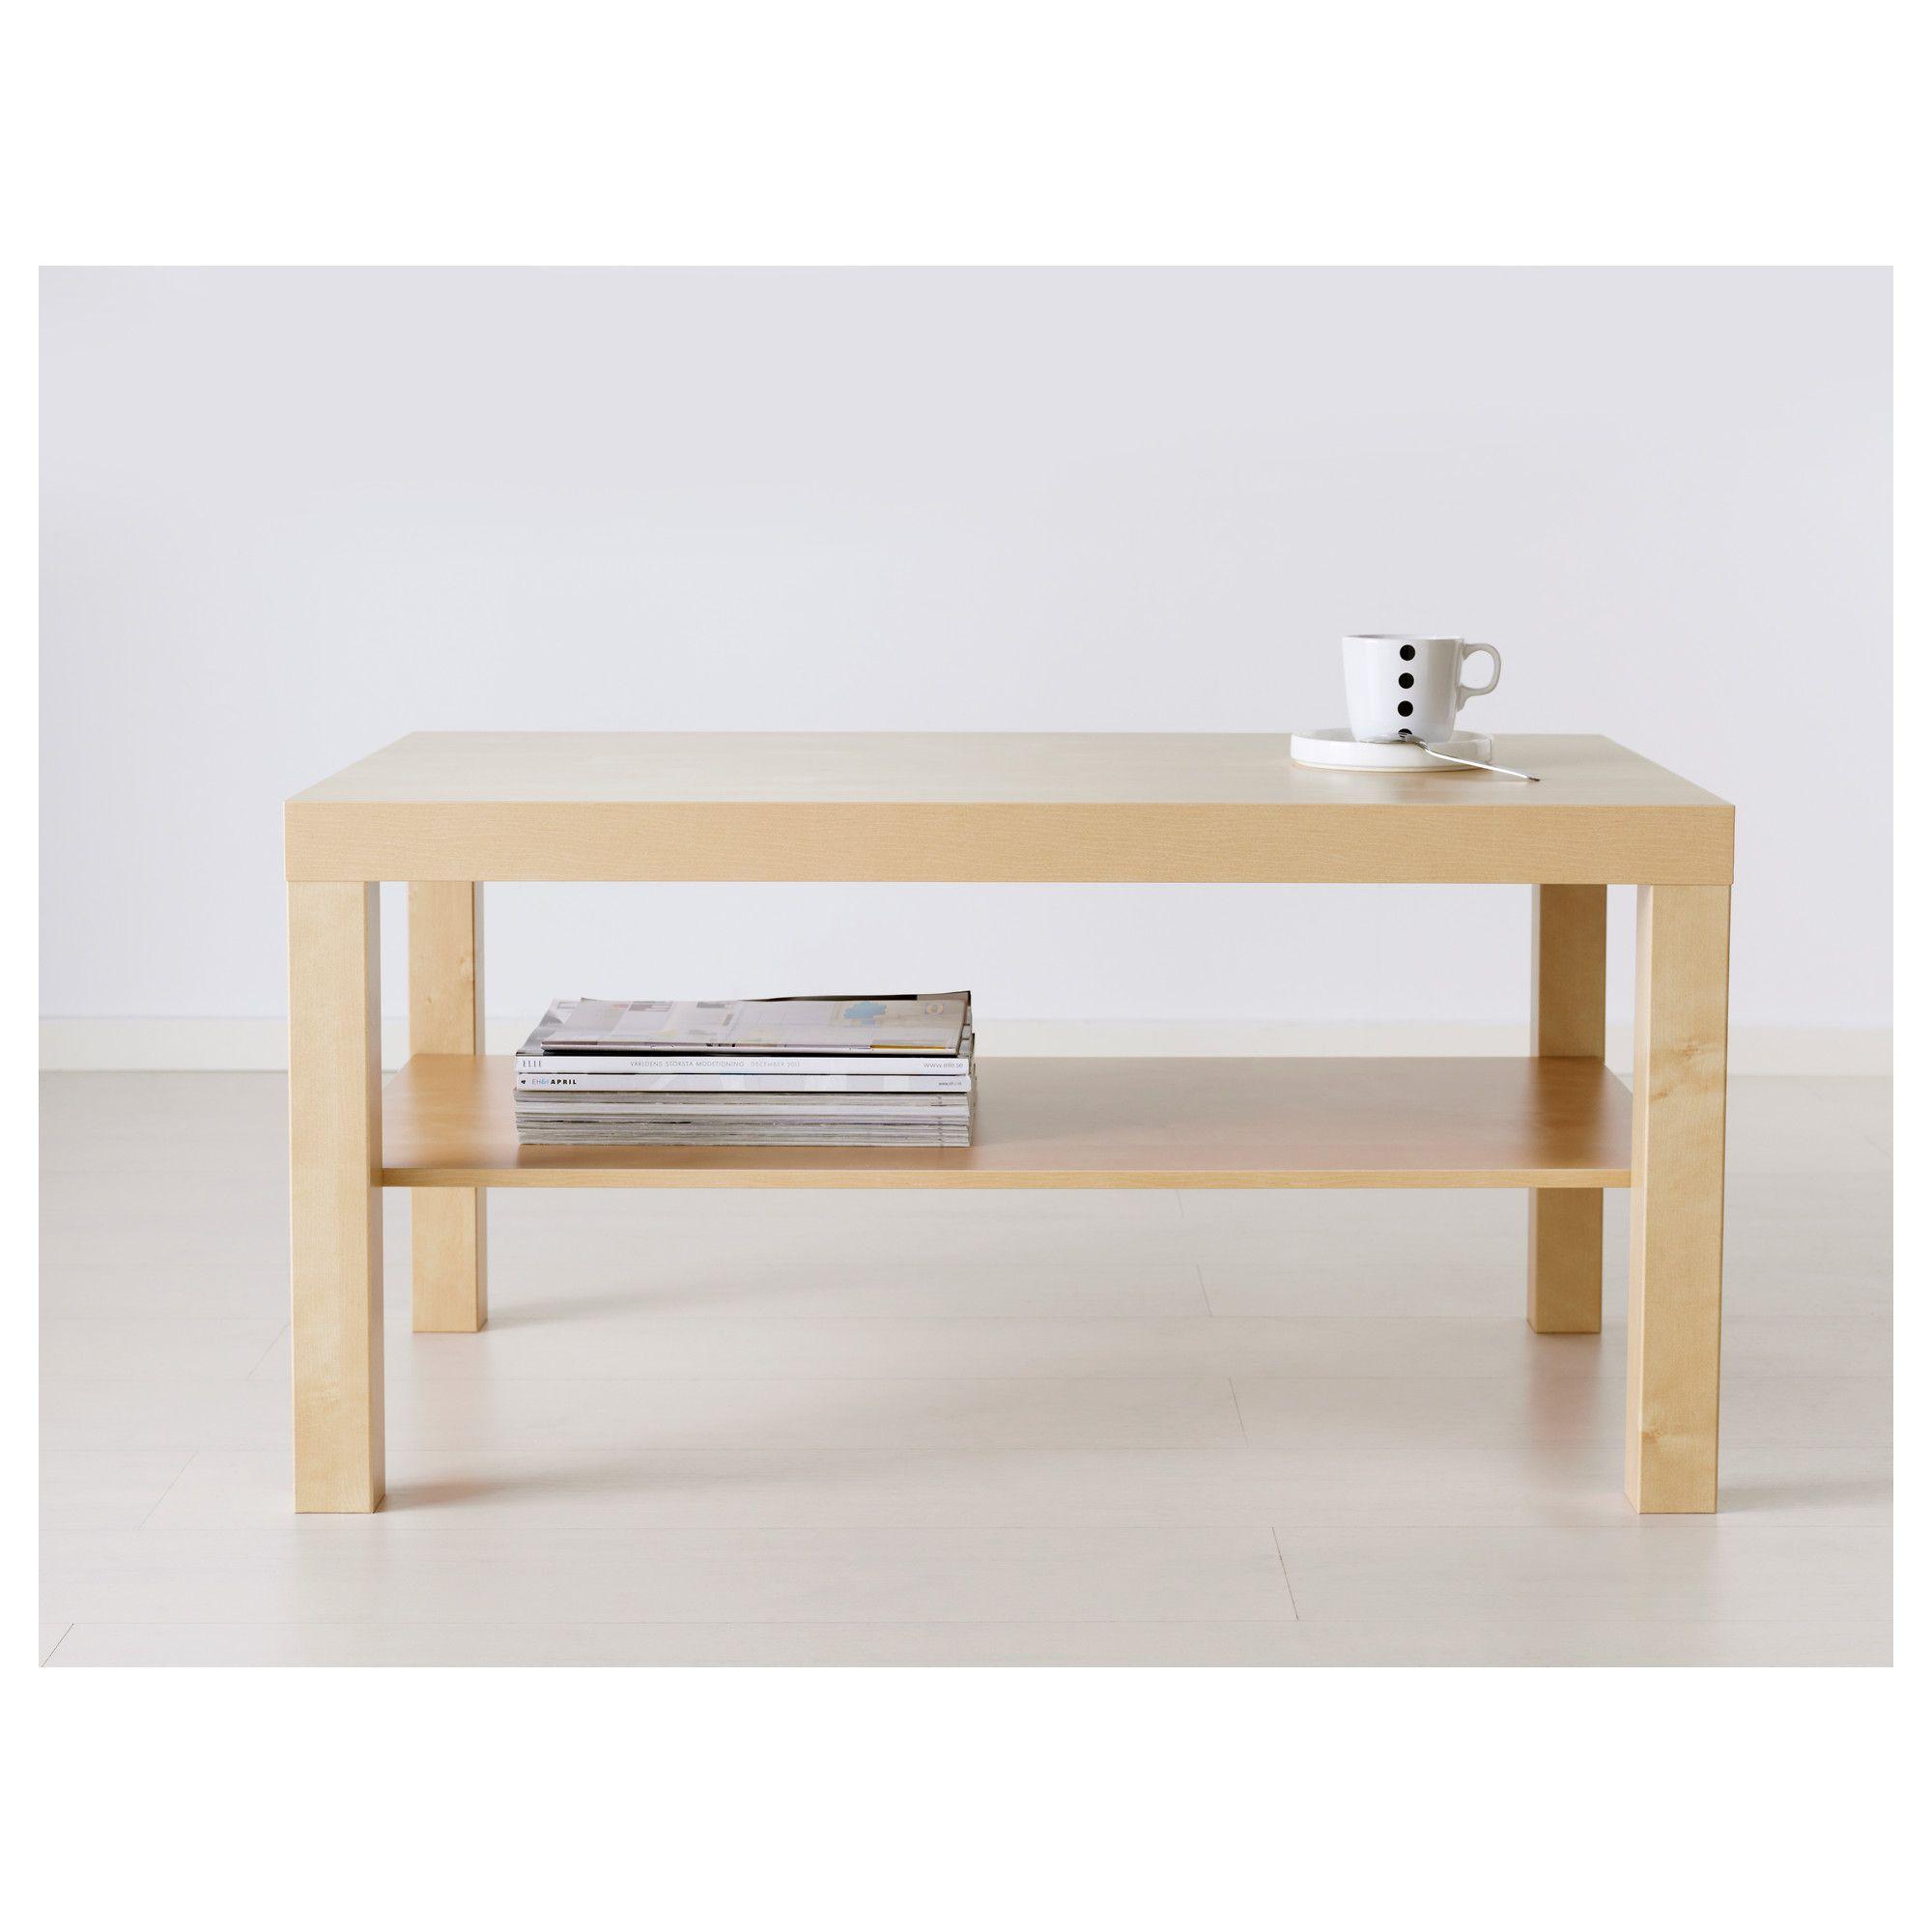 LACK ХоРна маса 90Х55 ефект бреза IKEA ikea